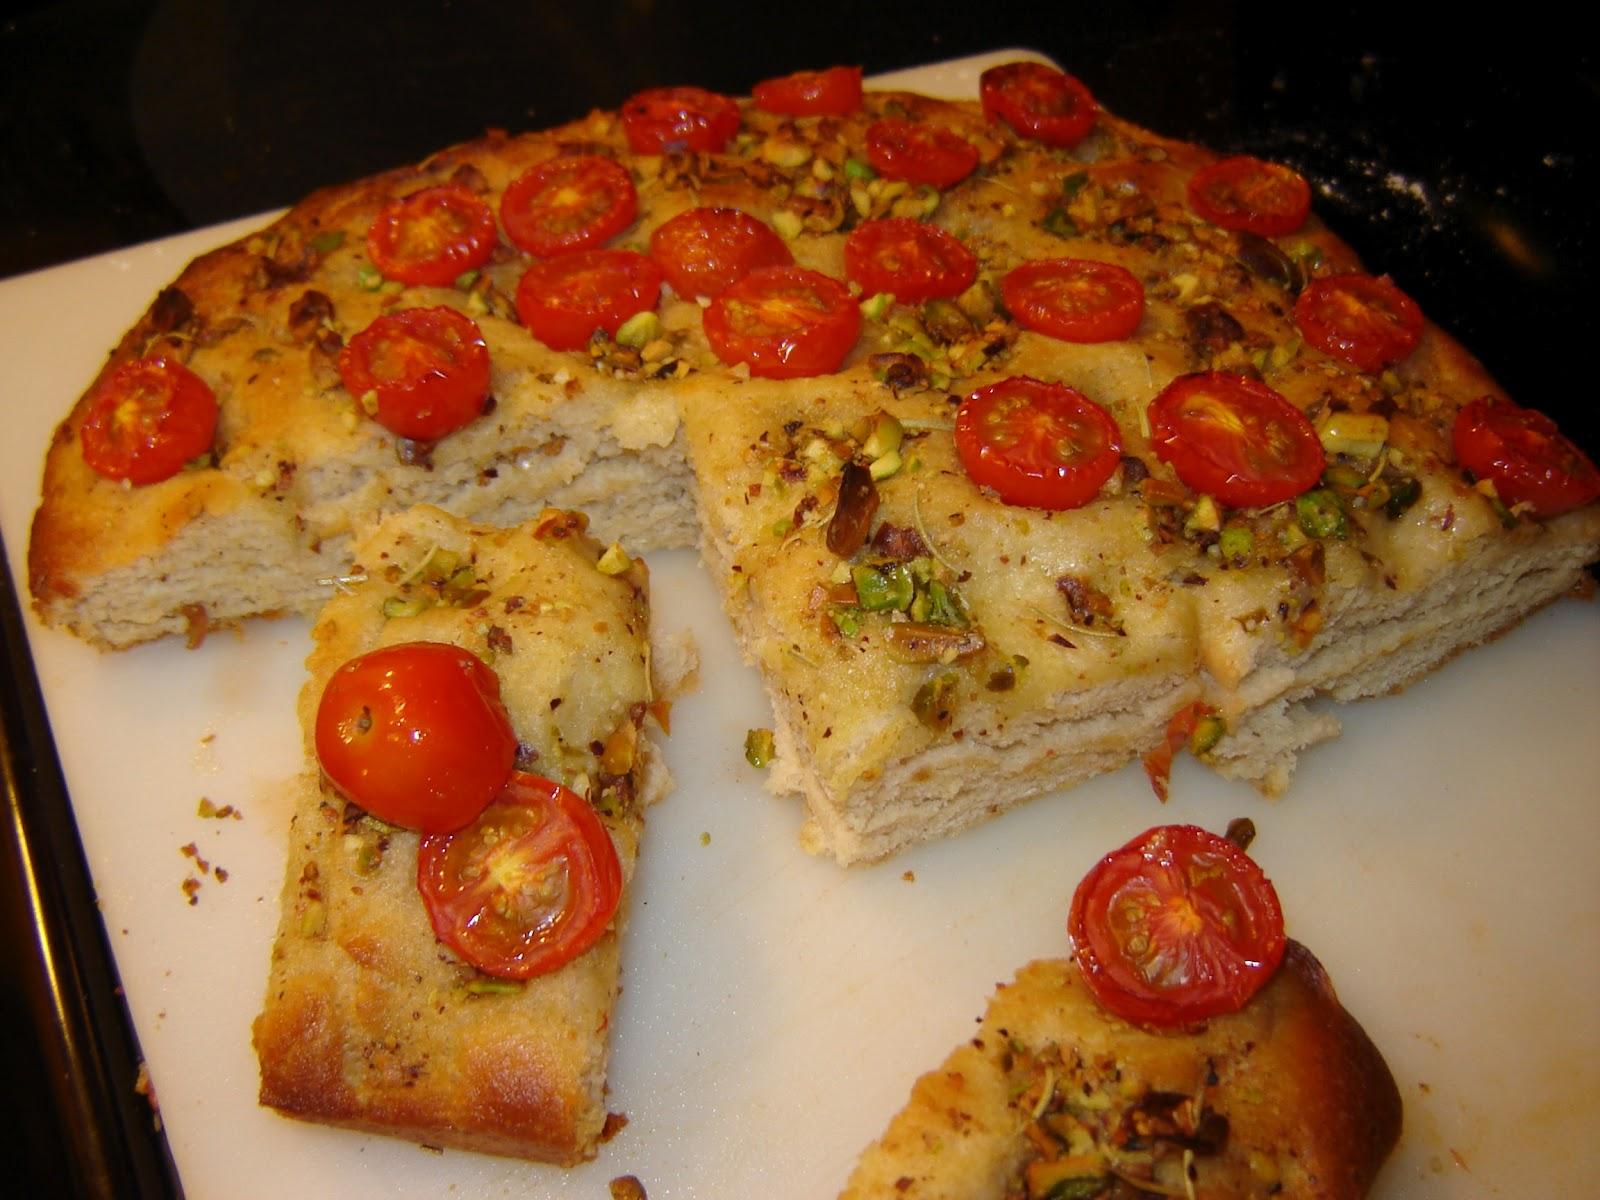 dinner is vegan cherry tomato focaccia bread